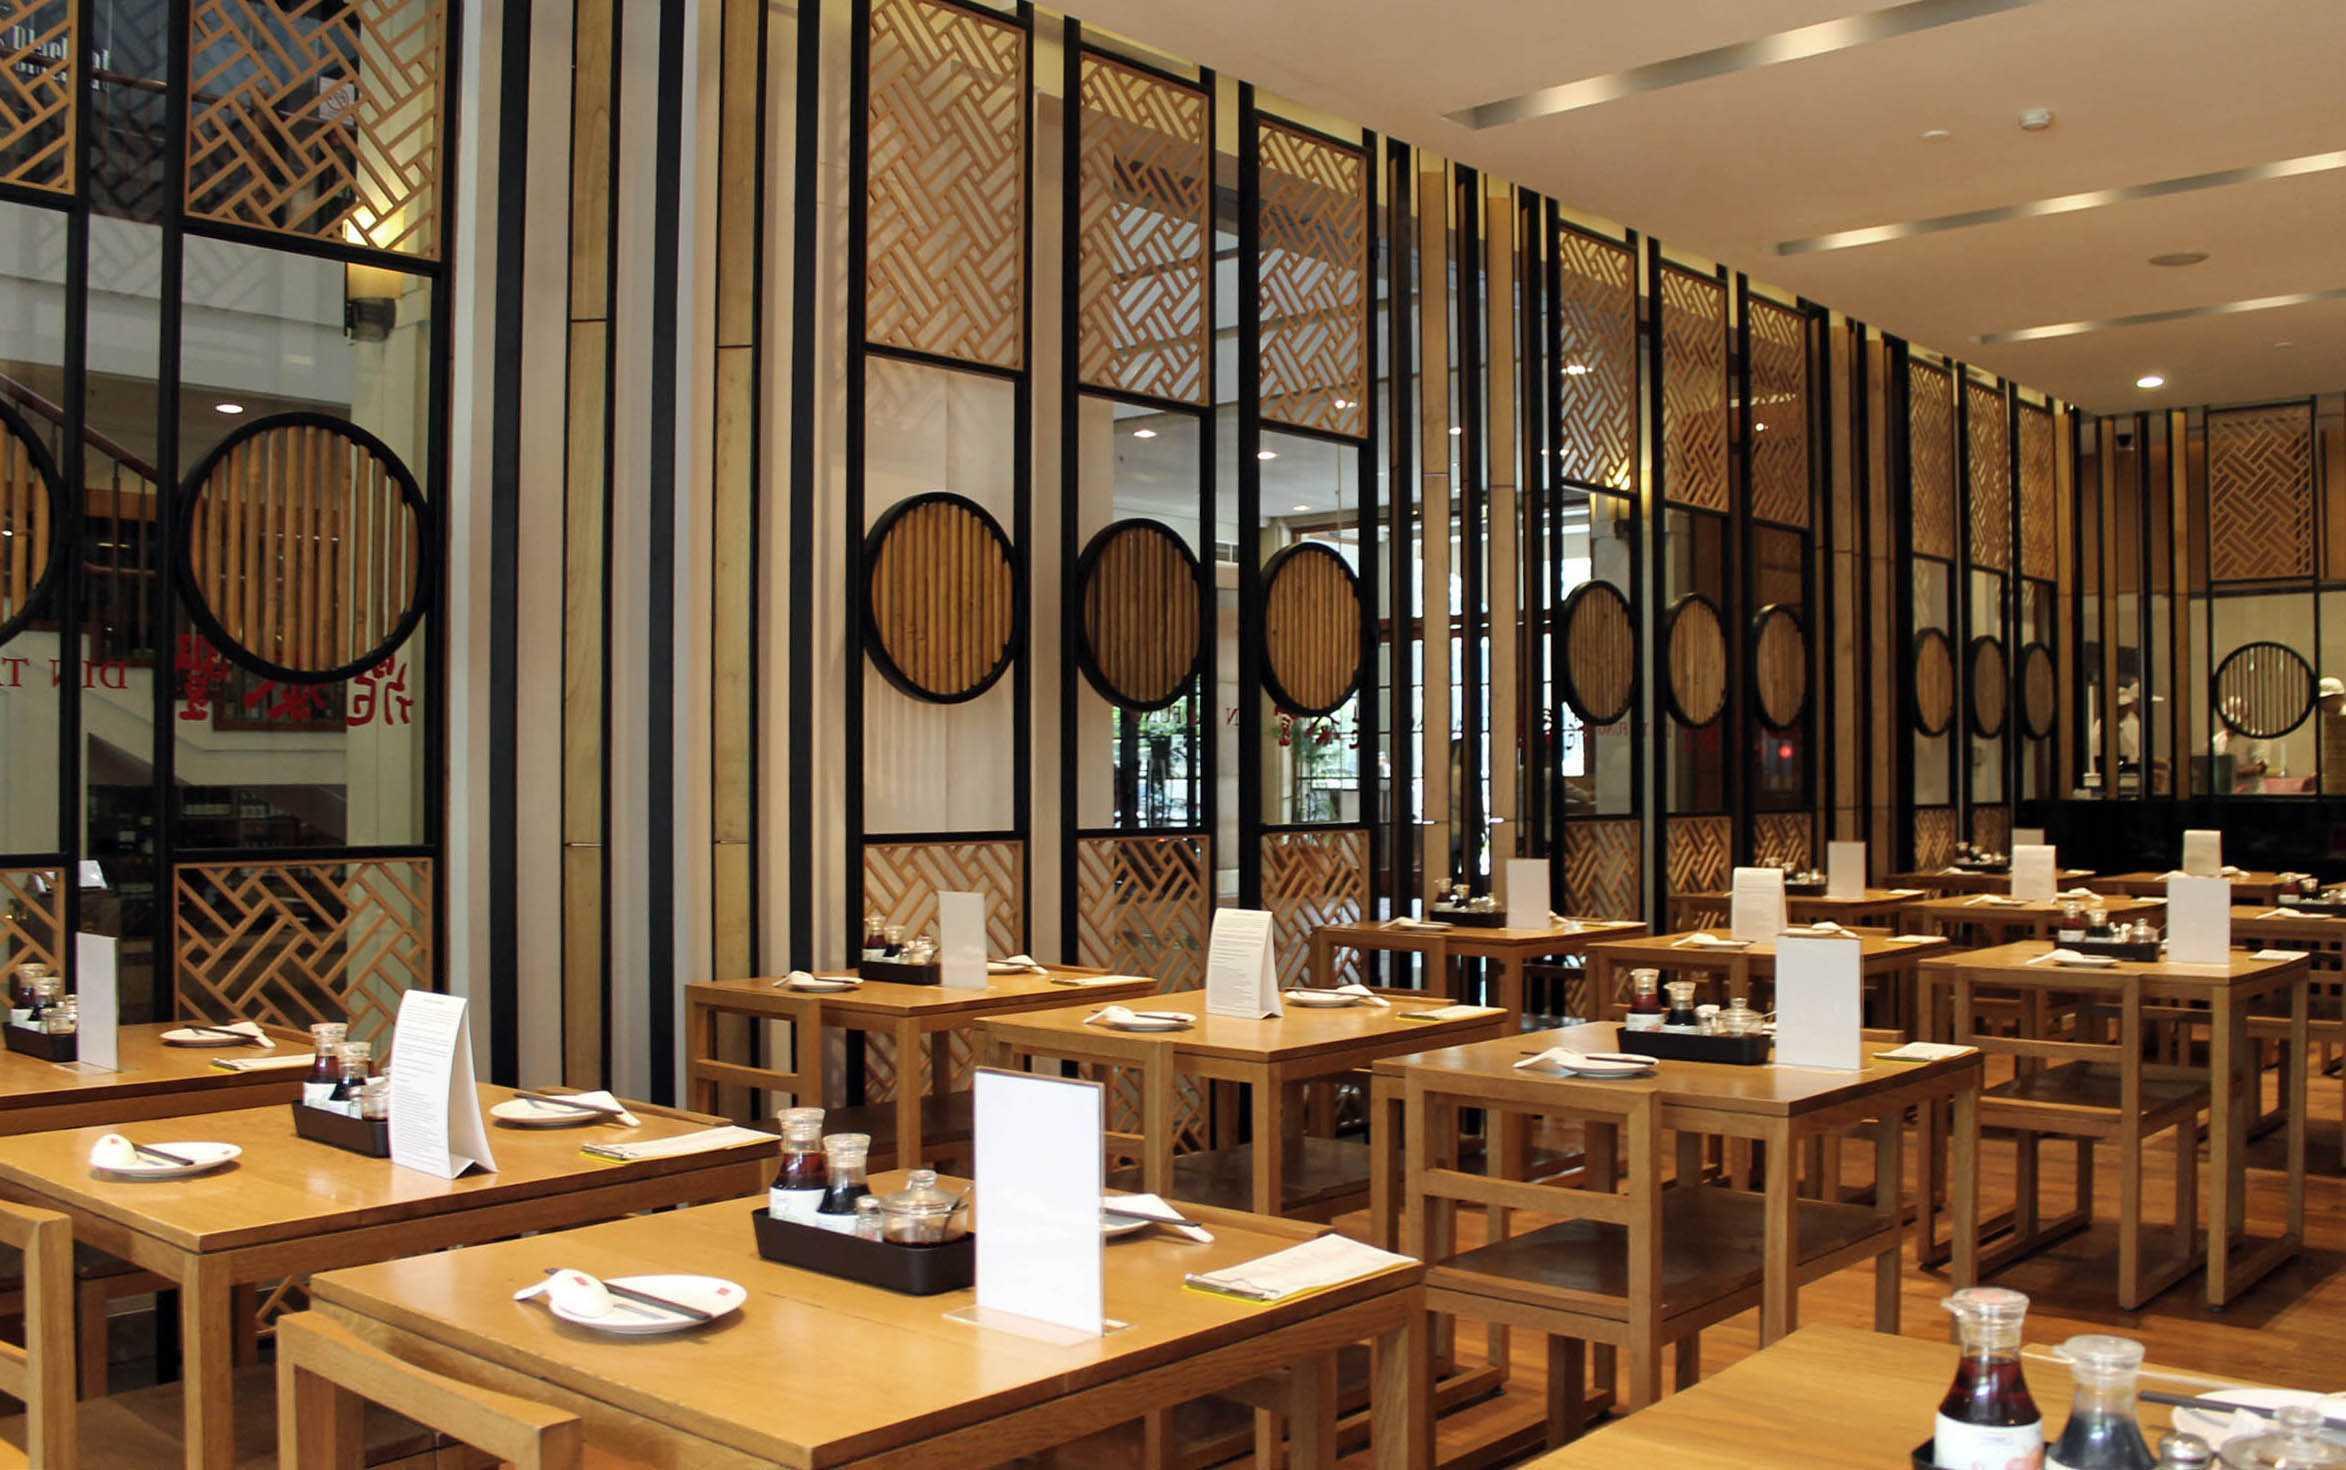 Rully Tanuwidjaja Interior Din Tai Fung Restaurant (Senayan) Plaza Arcadia Senayan, Jl. New Dhelhi, Gelora, Tanahabang, Central Jakarta City, Jakarta 10270, Indonesia  Seating Area Arcadia Contemporary  48175